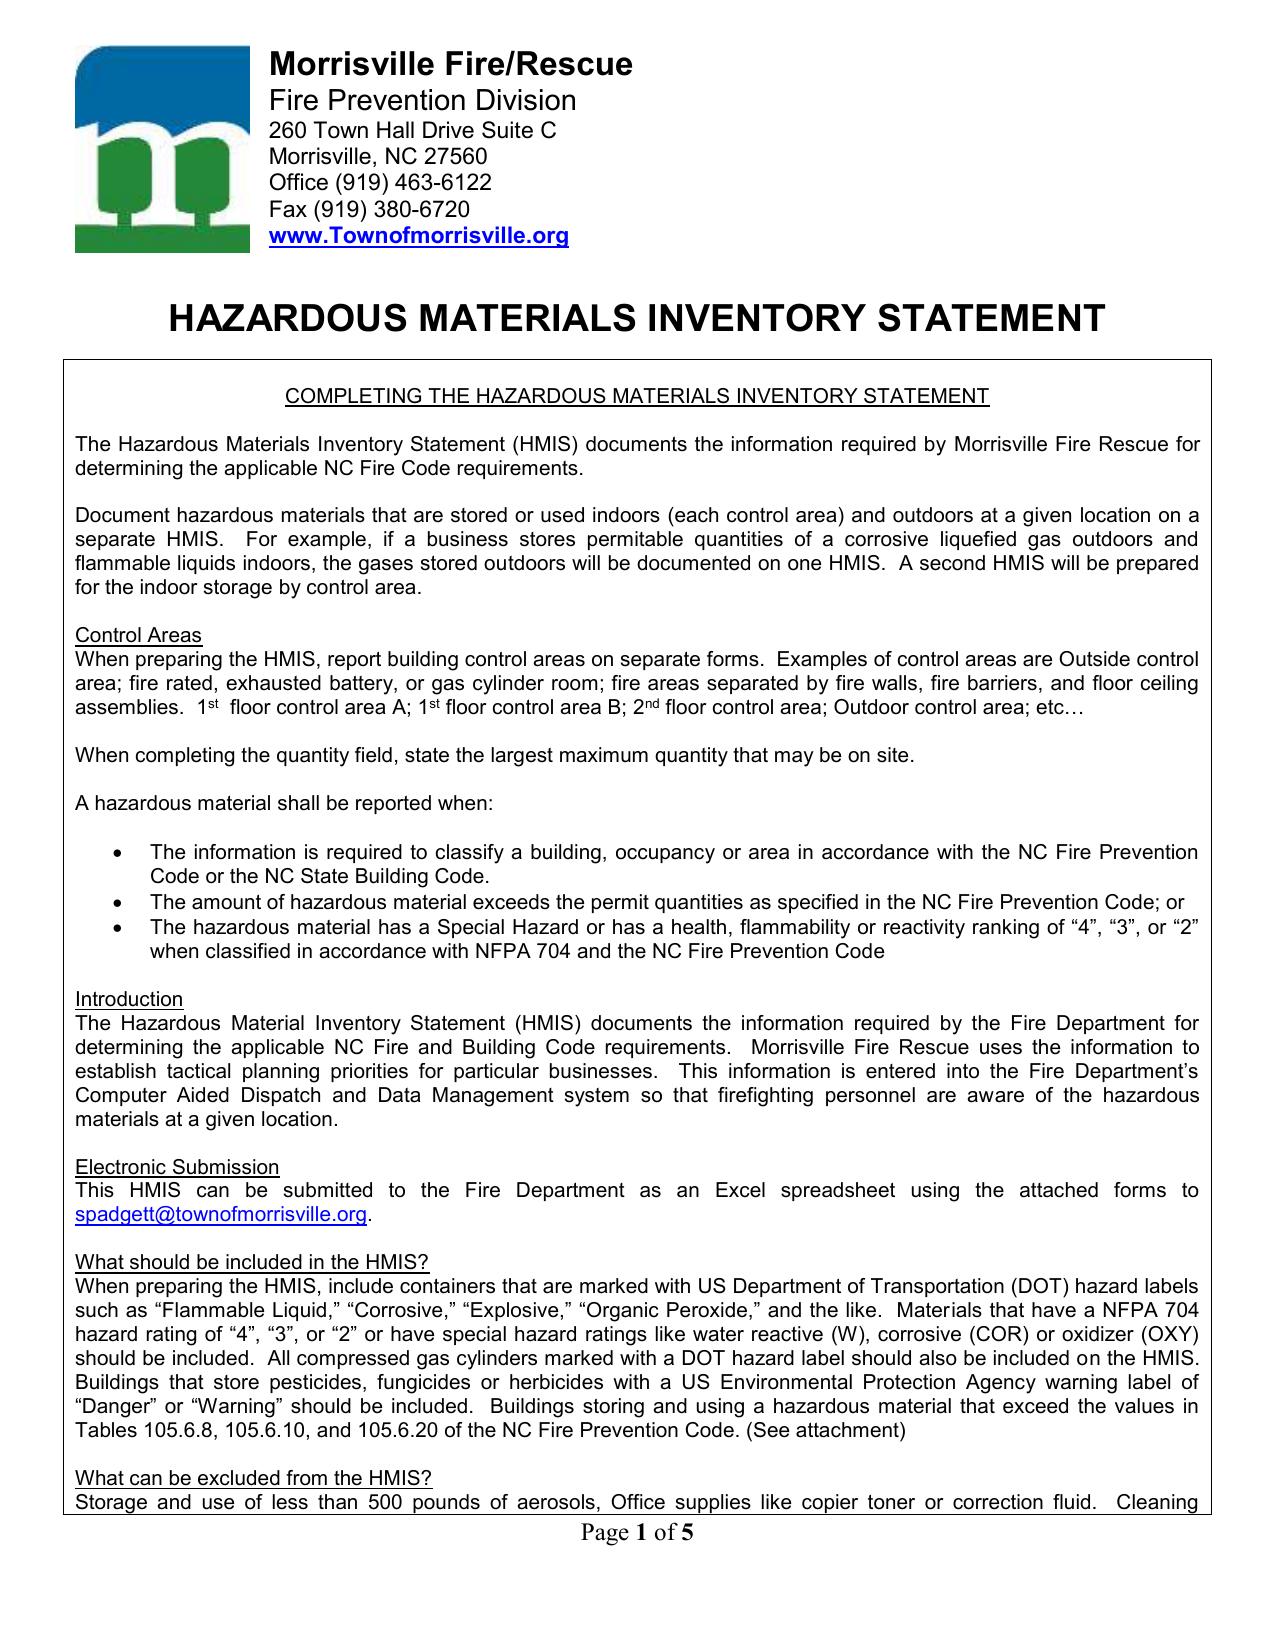 Hazardous Material Inventory Spreadsheet Inside Hazardous Materials Inventory Statement